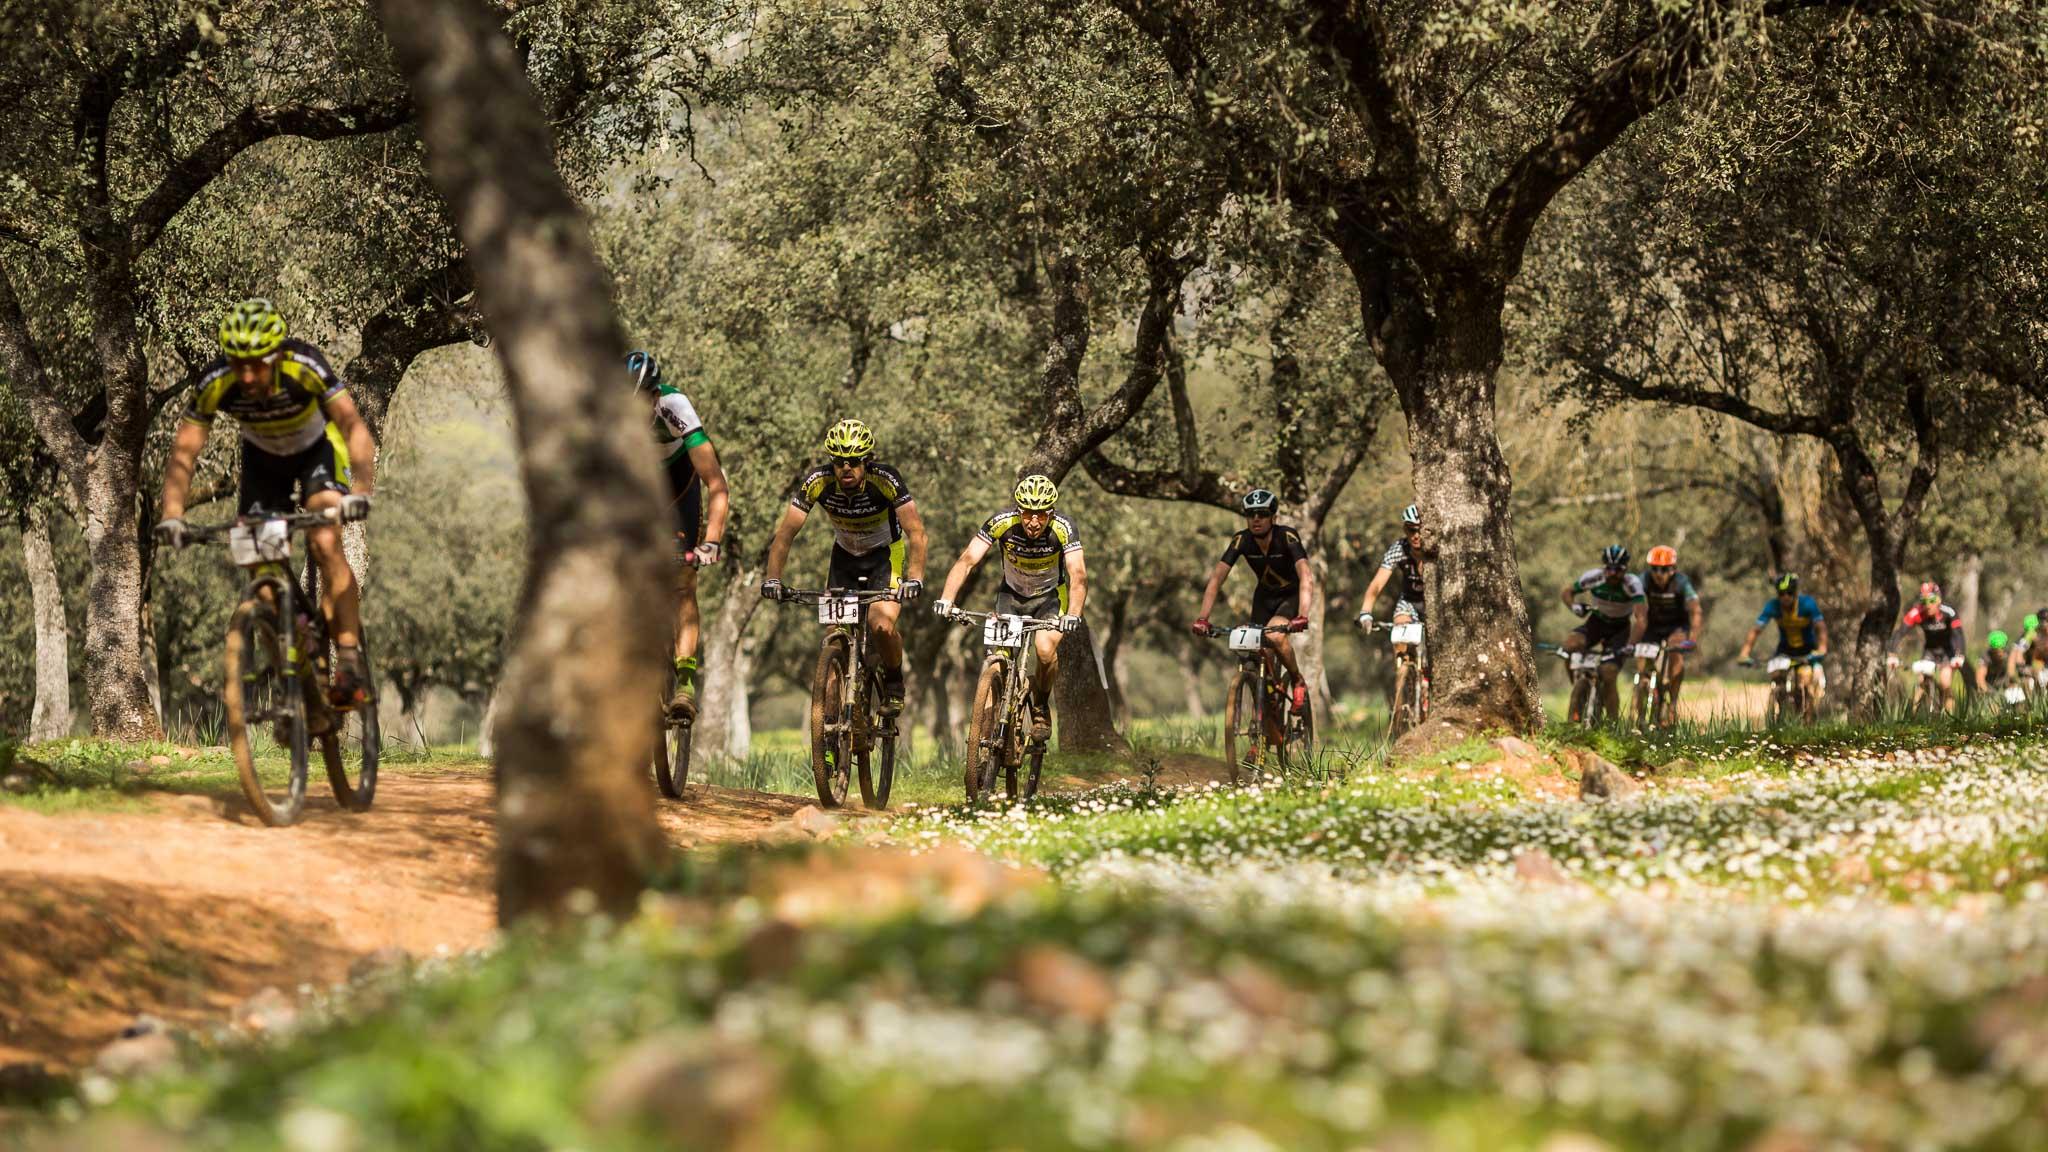 20160223-Andalucia-Bike-Race-2016-B29B0569